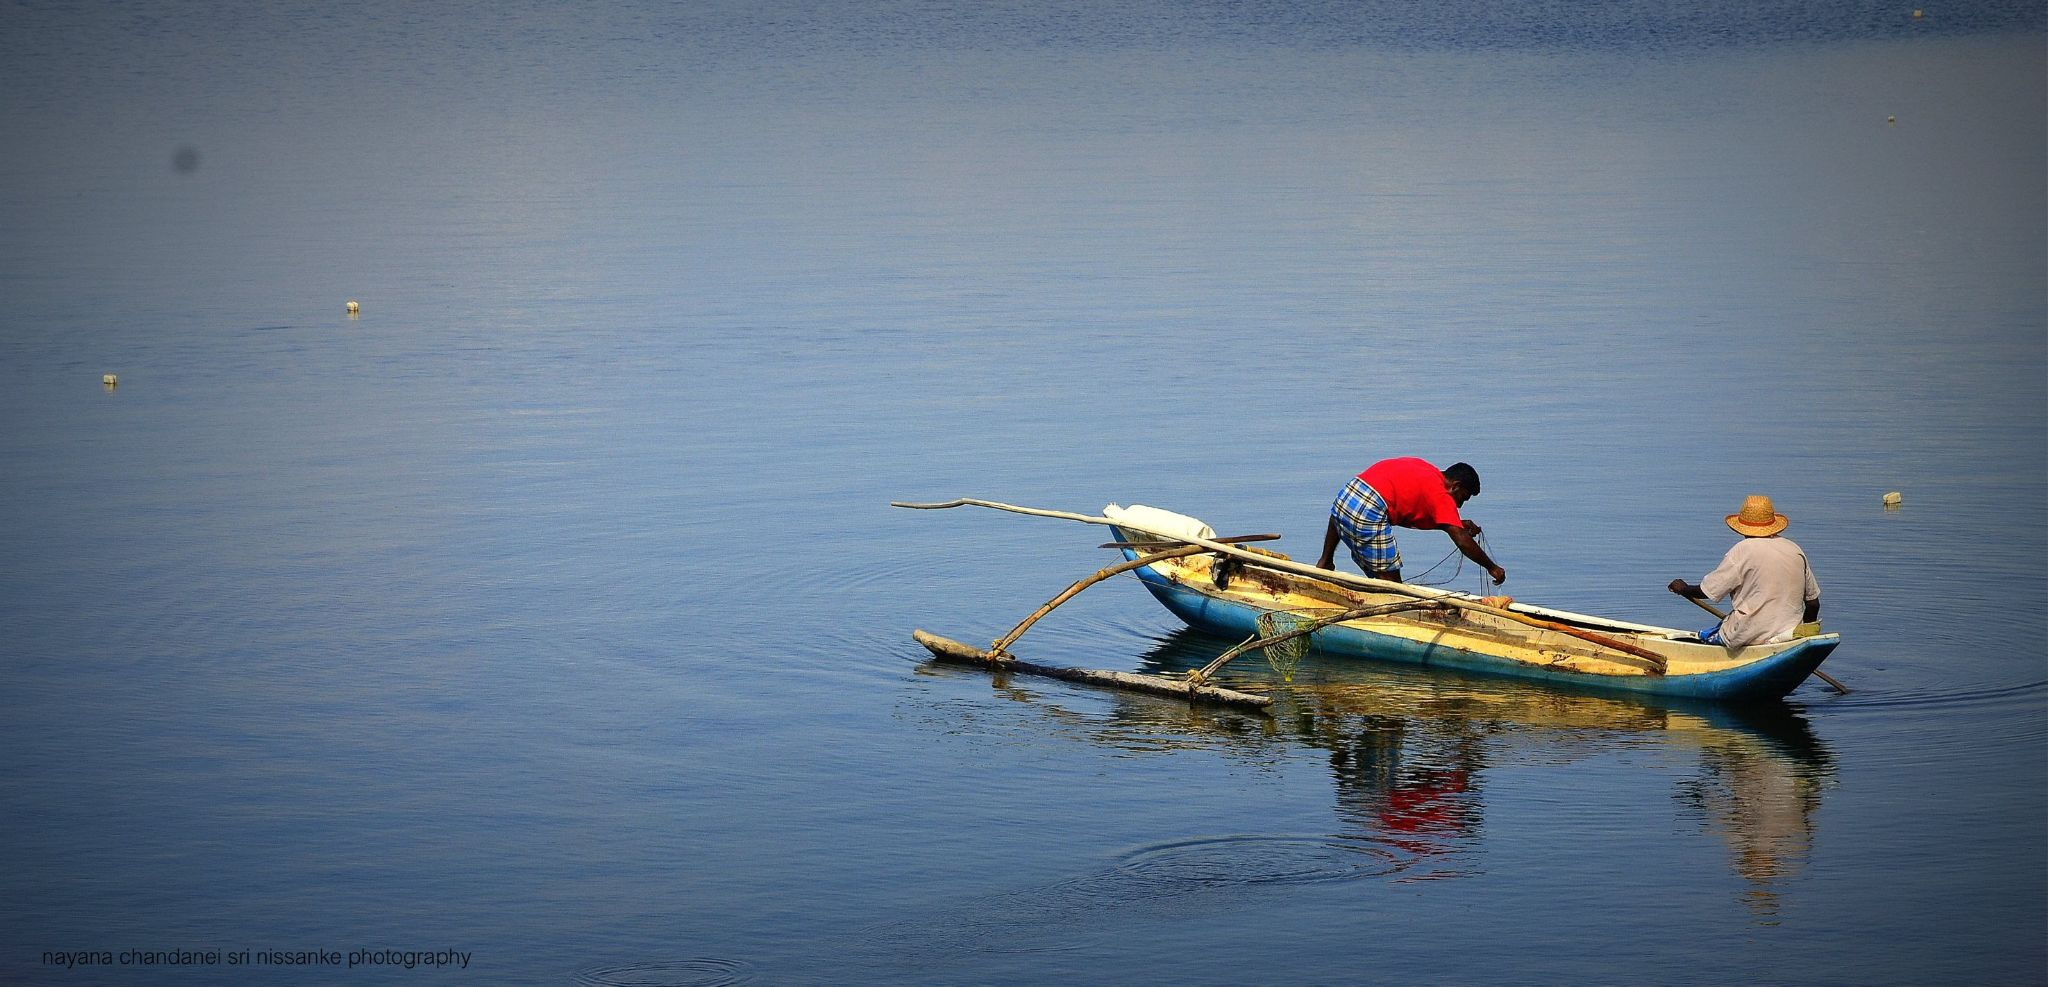 fishing by nayanachandaneisrinissanke